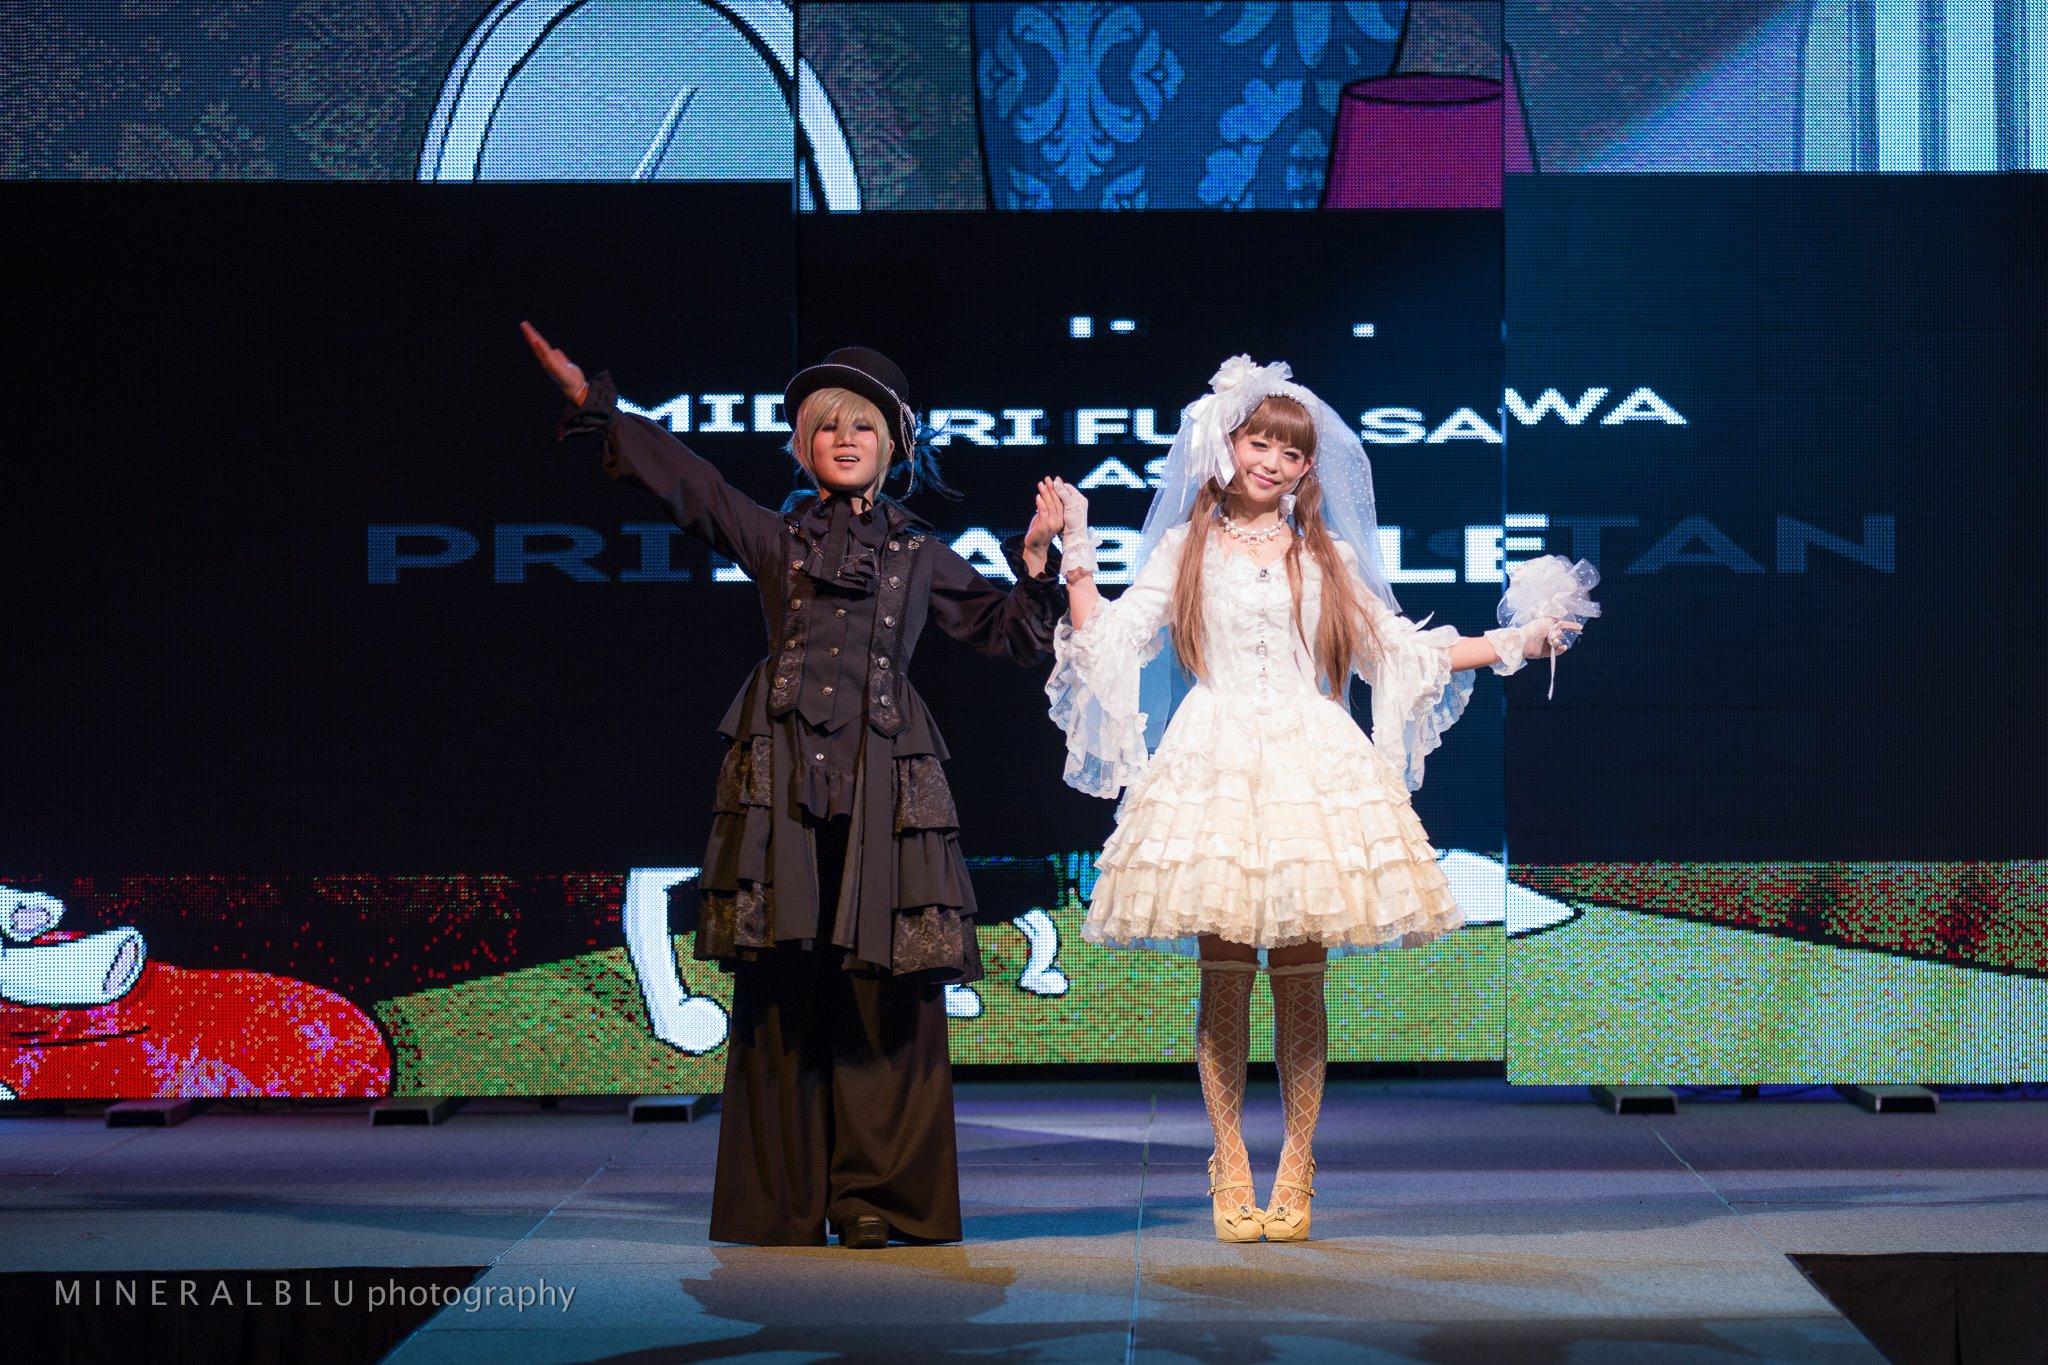 J Fashion Show 2014 feat. Reika and Midori Fukasawa  - photo by mineralblu